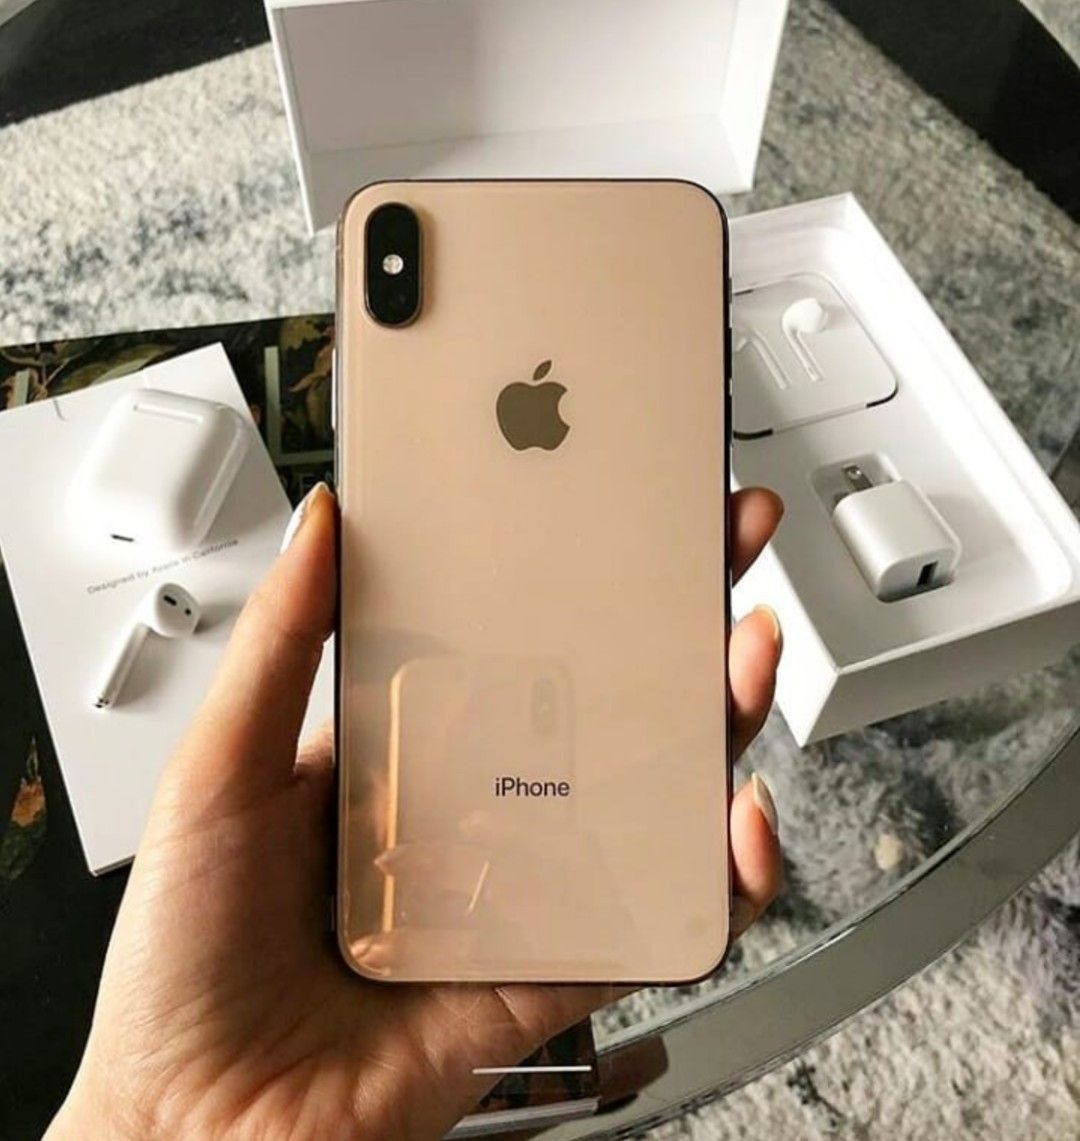 Iphone Iphonexr Iphonexsmax Iphonexs Apple Acessorios Iphone Conserto De Iphone Celulares Iphone